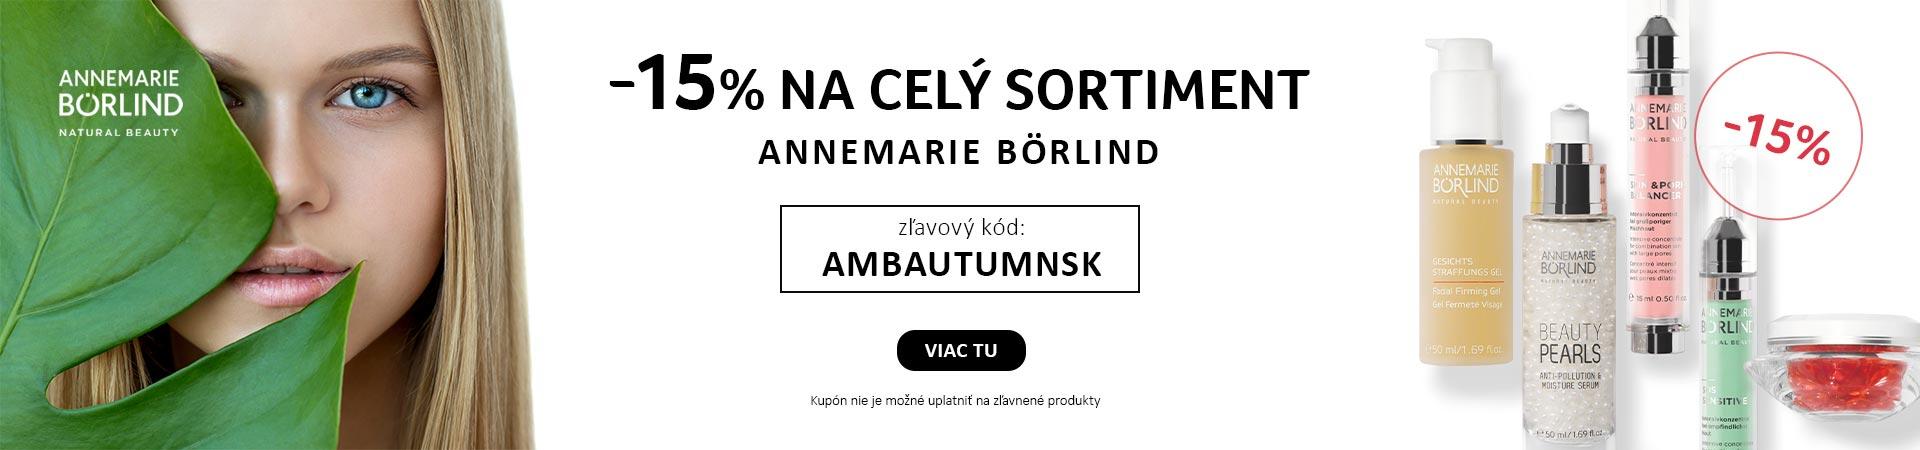 Annemarie Borlind -15% na všetko